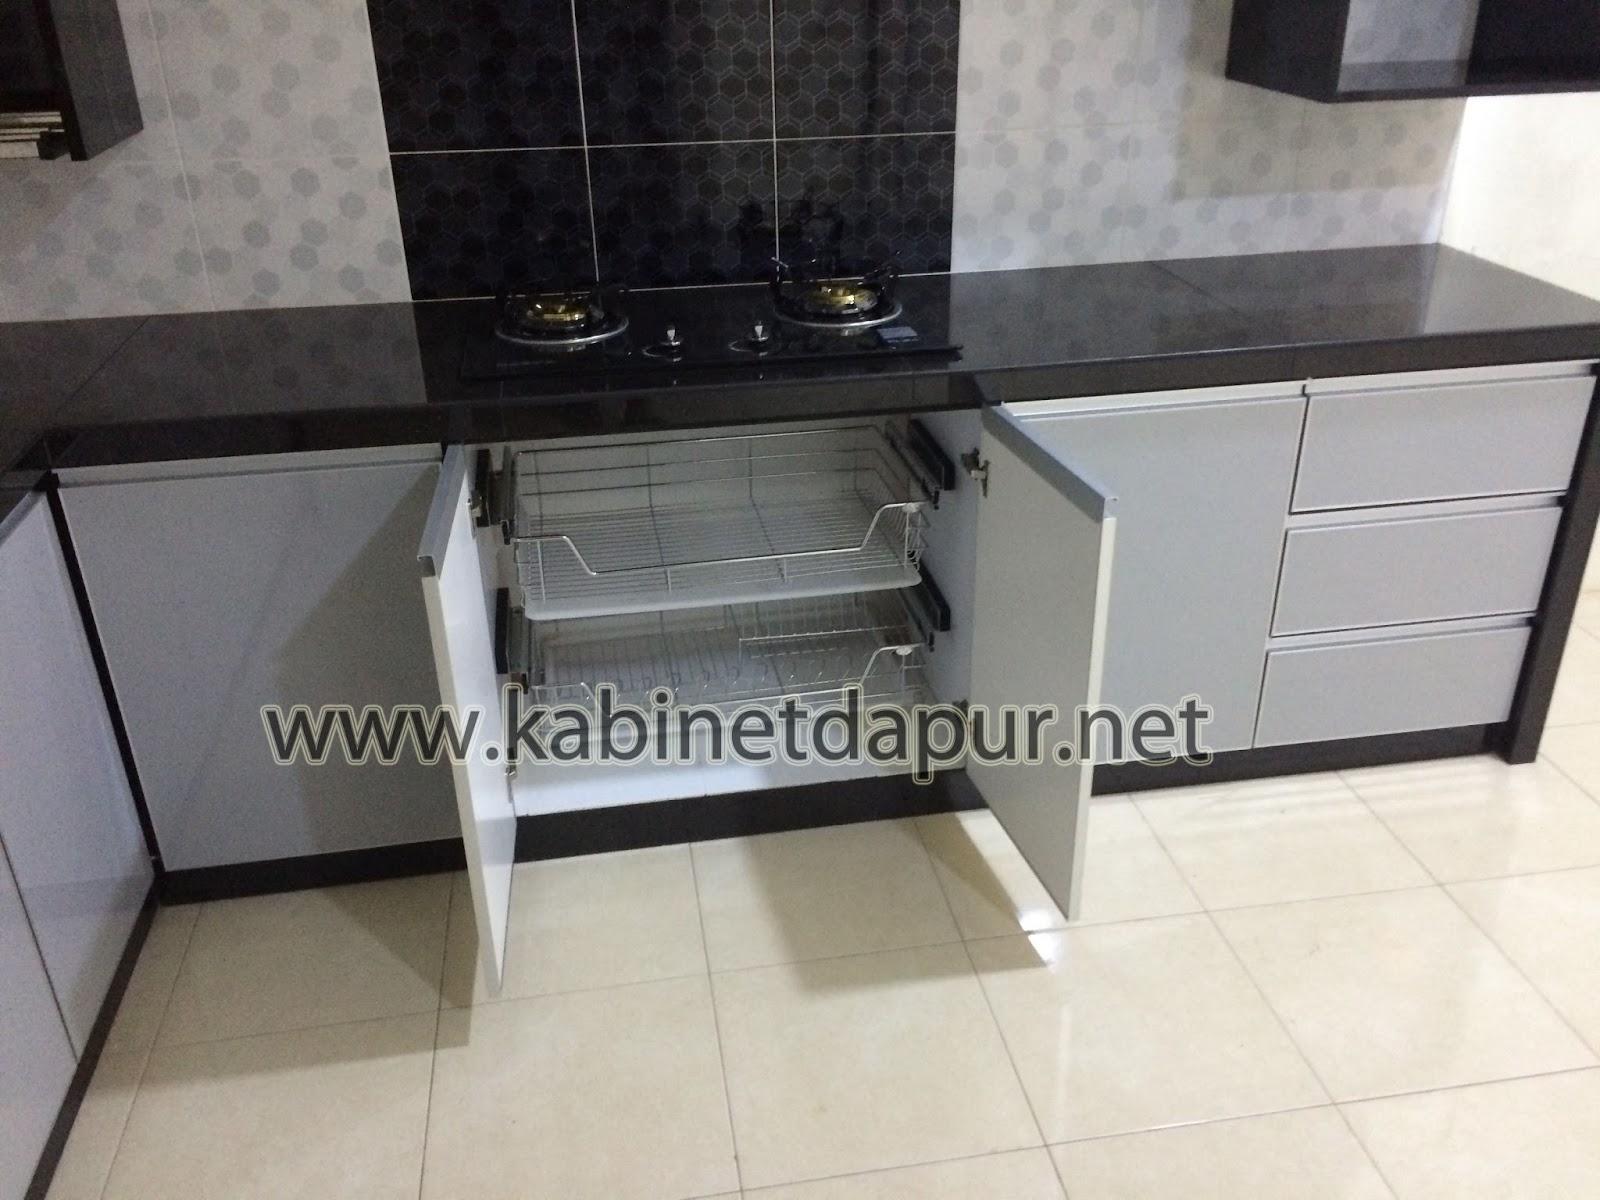 Alammualai Ini Projek Kabinet Dapur Kami Yg Terbaru Bulan Disember 2017 Table Top Konkrit Kemasan Mozek 2 Kaki Pintu Material Formika